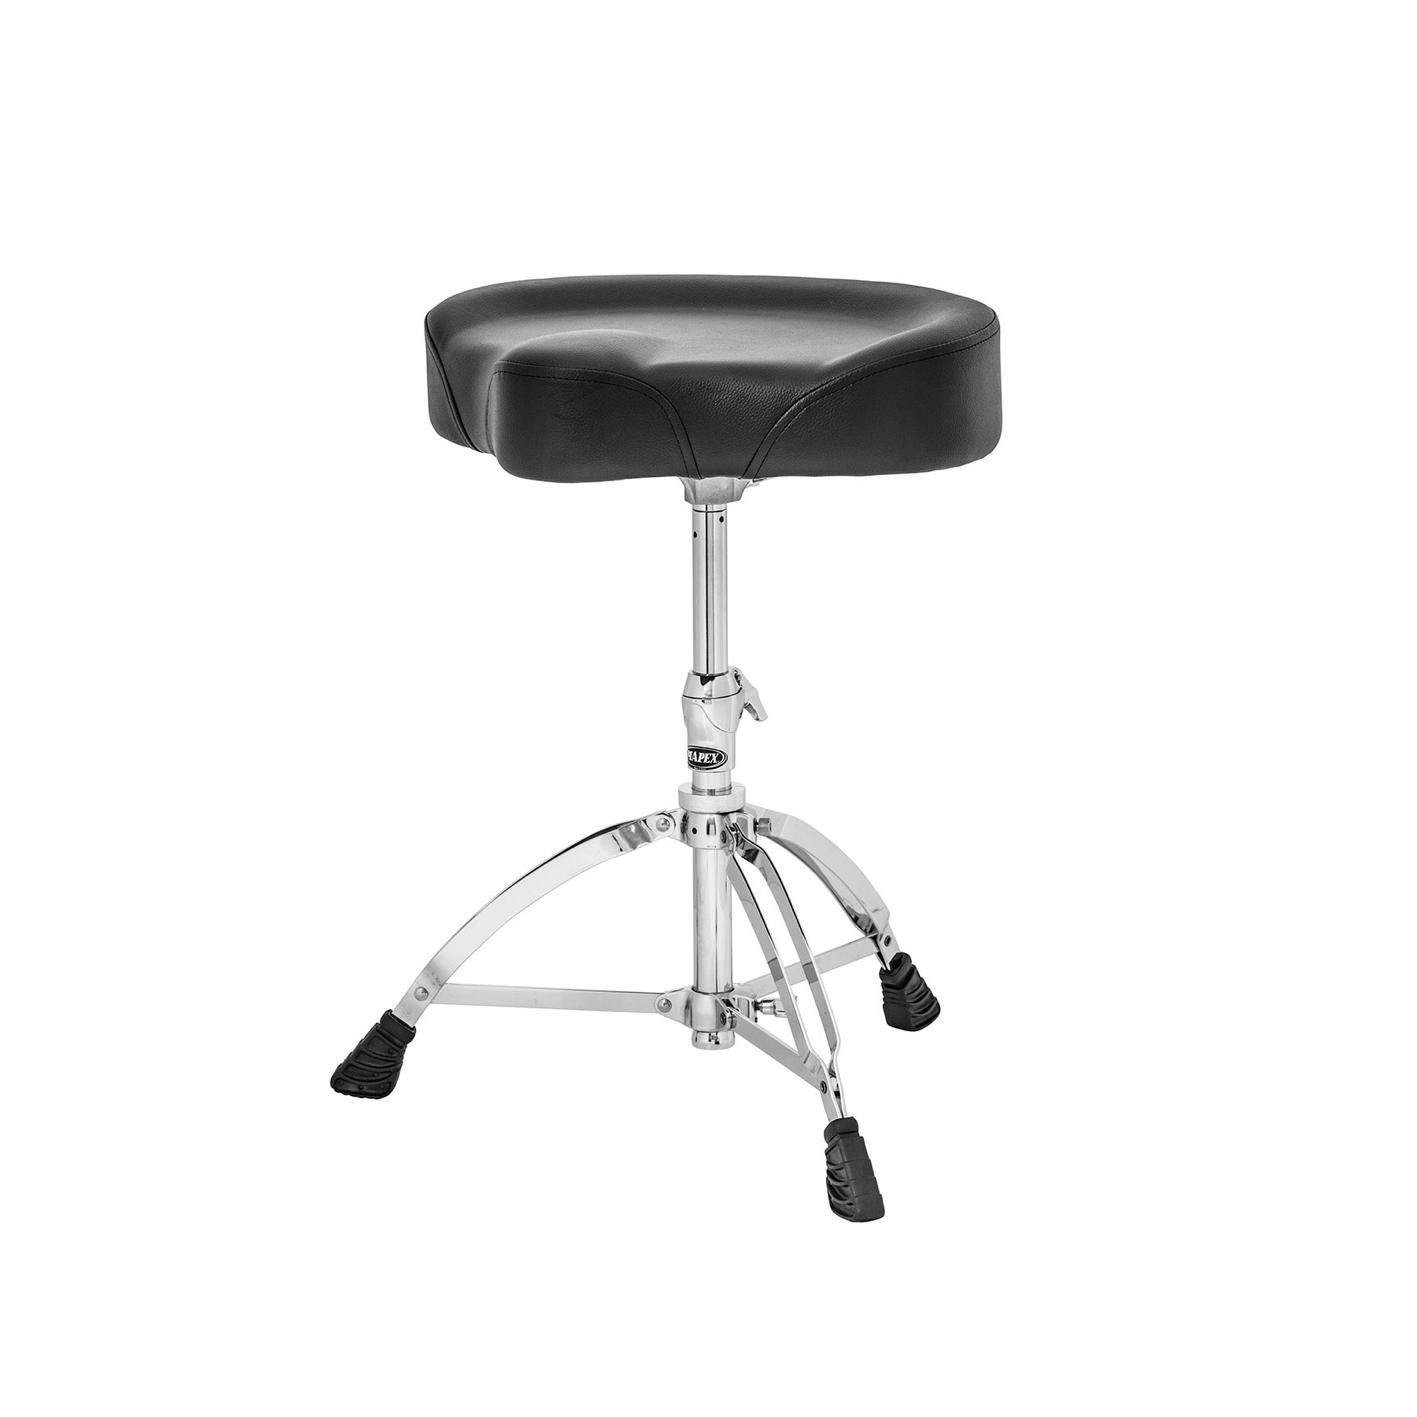 Mapex T575A Saddle Drum Throne